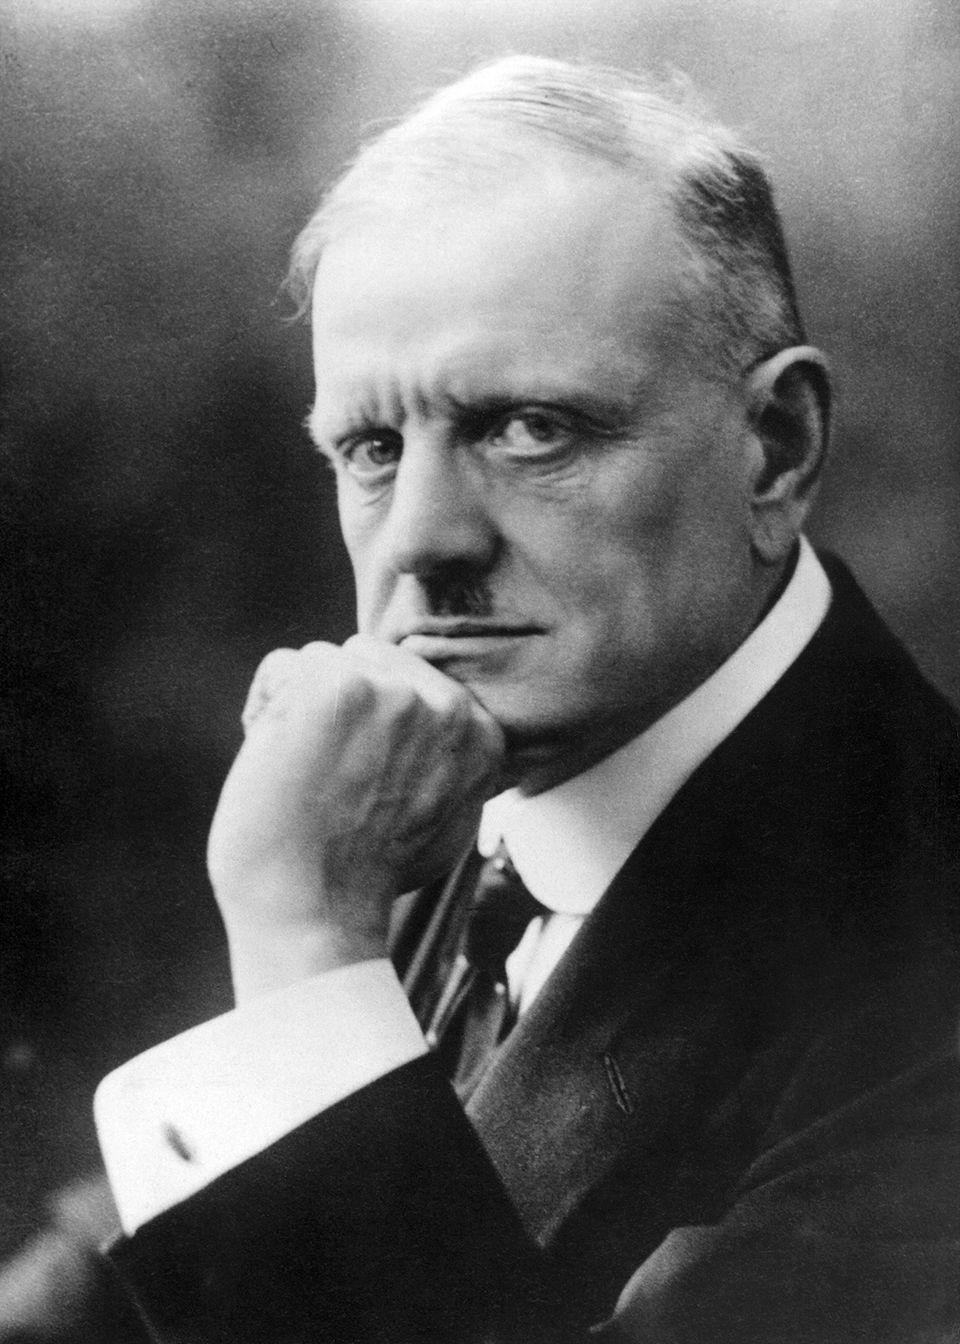 Early version of Jean Sibelius's Violin Concerto Op.47 - sheet music